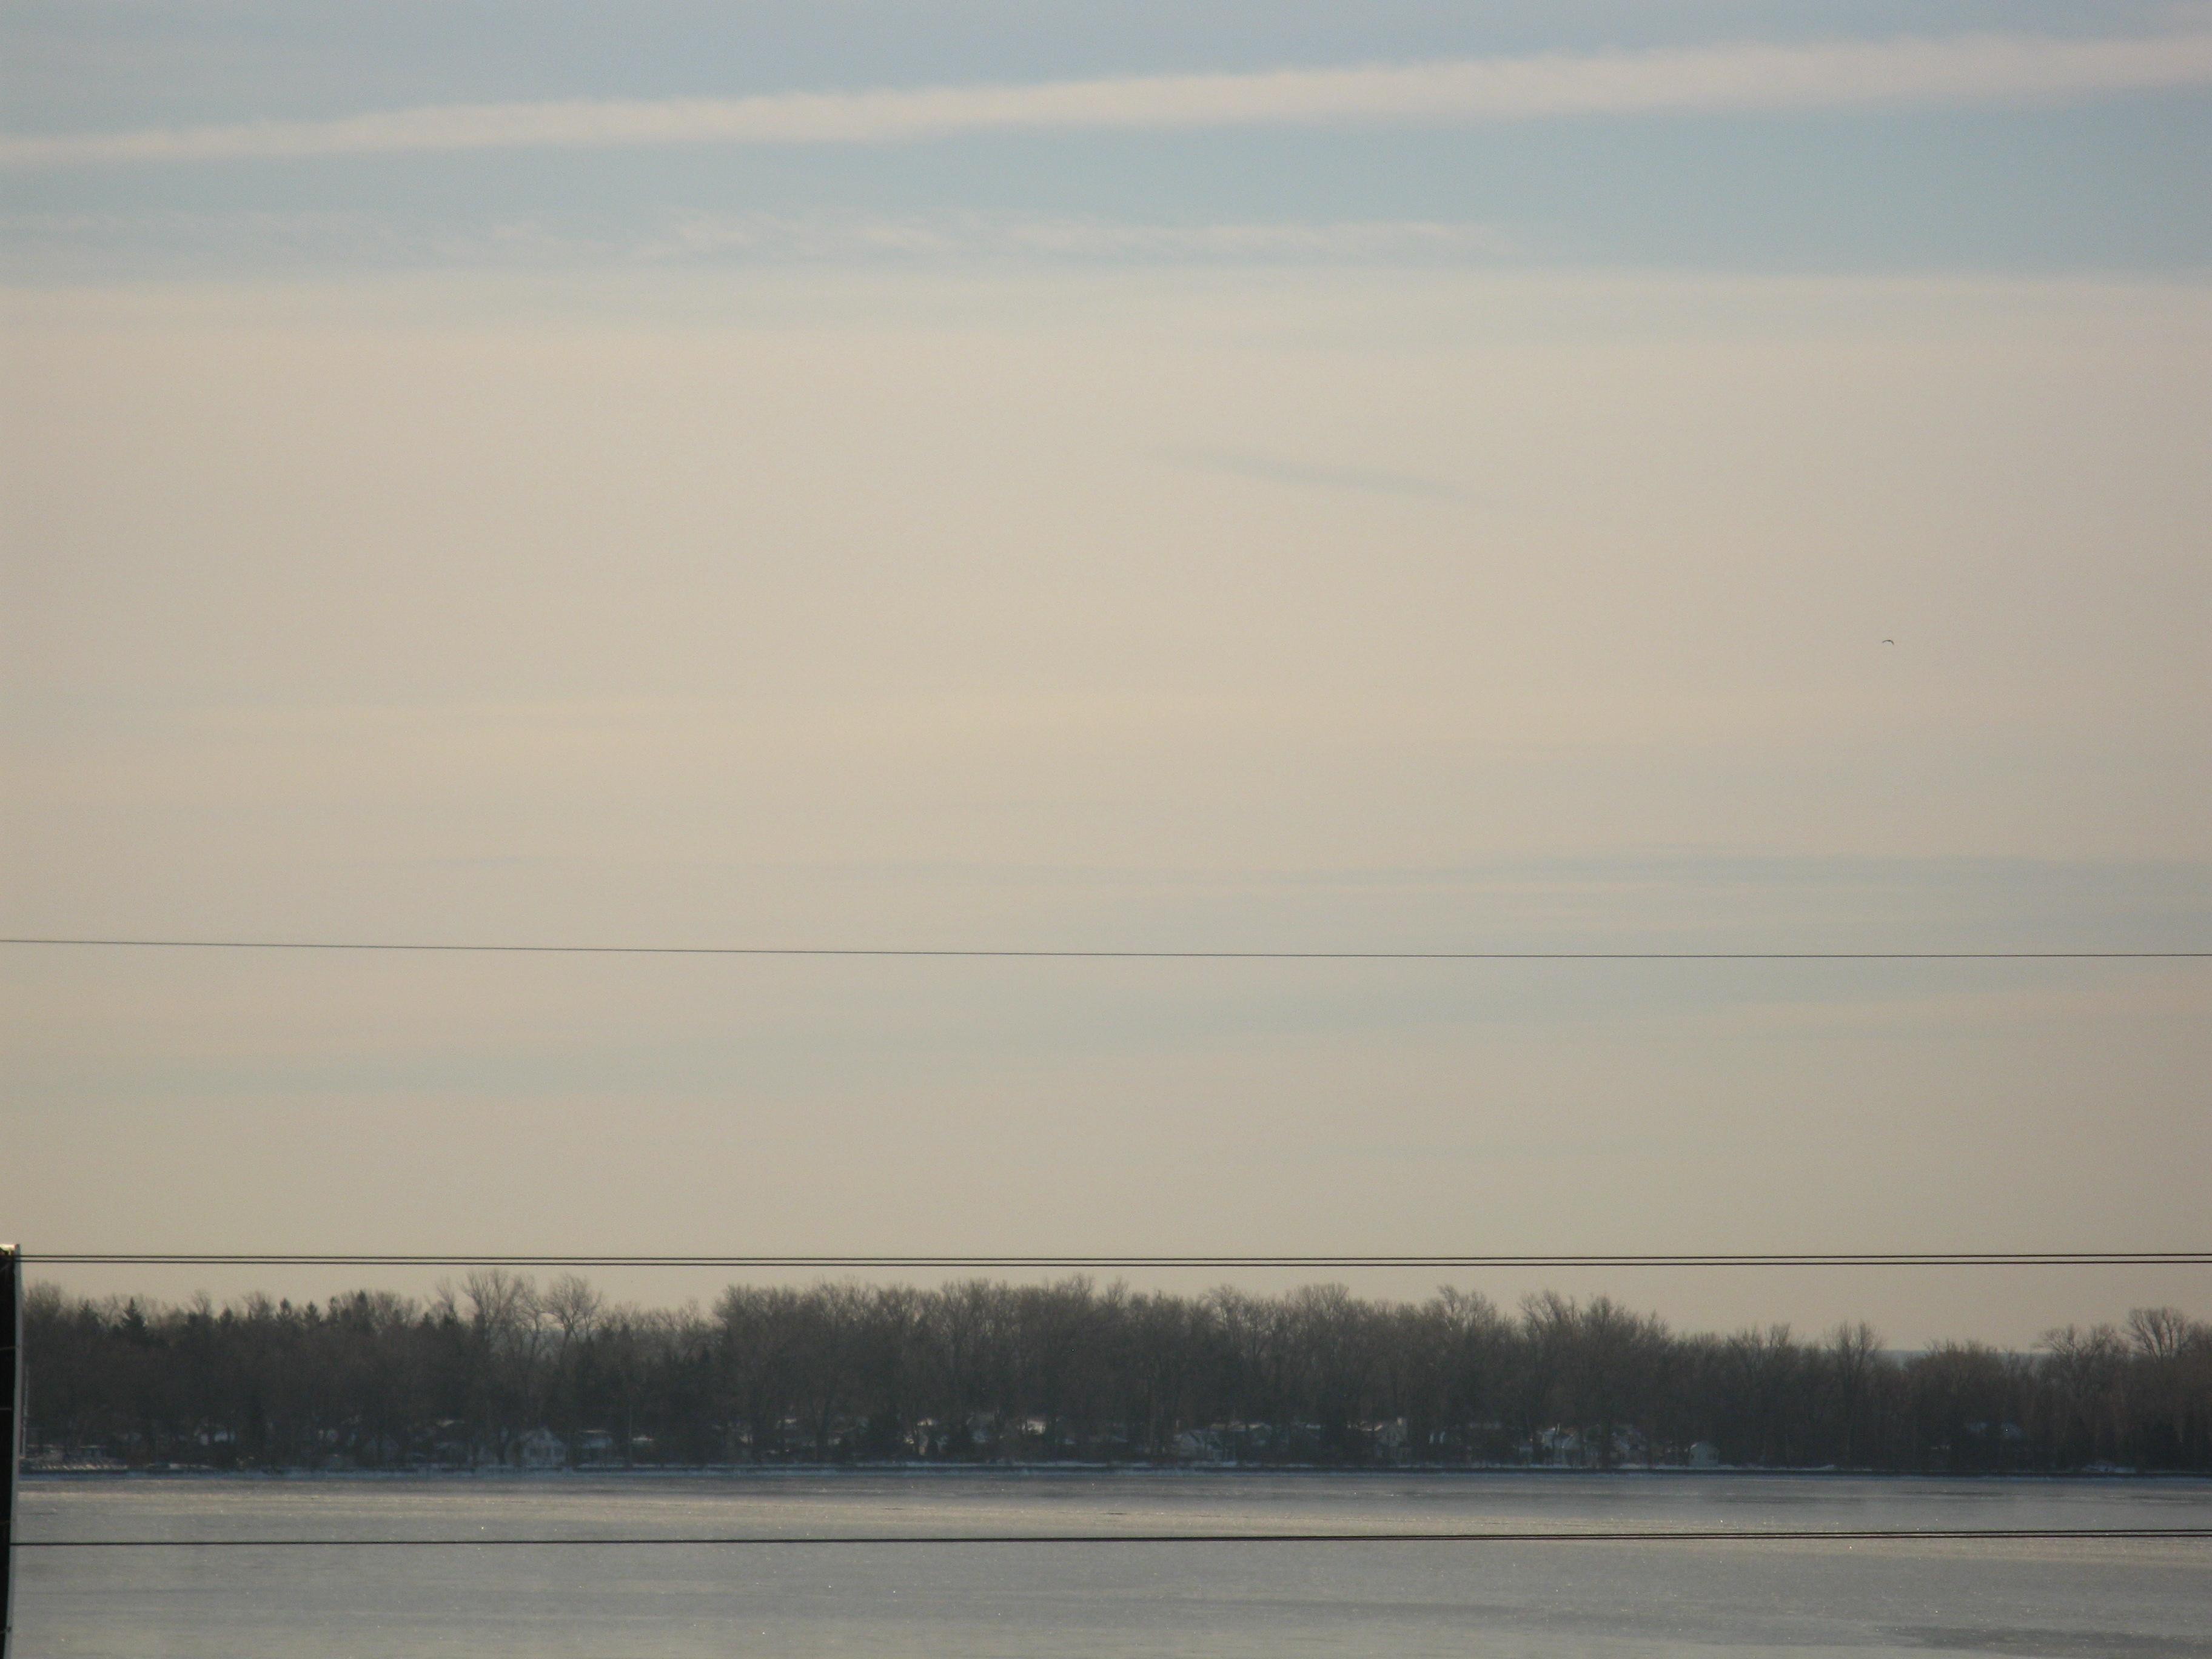 Frozen Toronto harbour, 9ish, 2013 02 10 -ak.JPG, Coast, Landscape, Ocean, Outdoor, HQ Photo